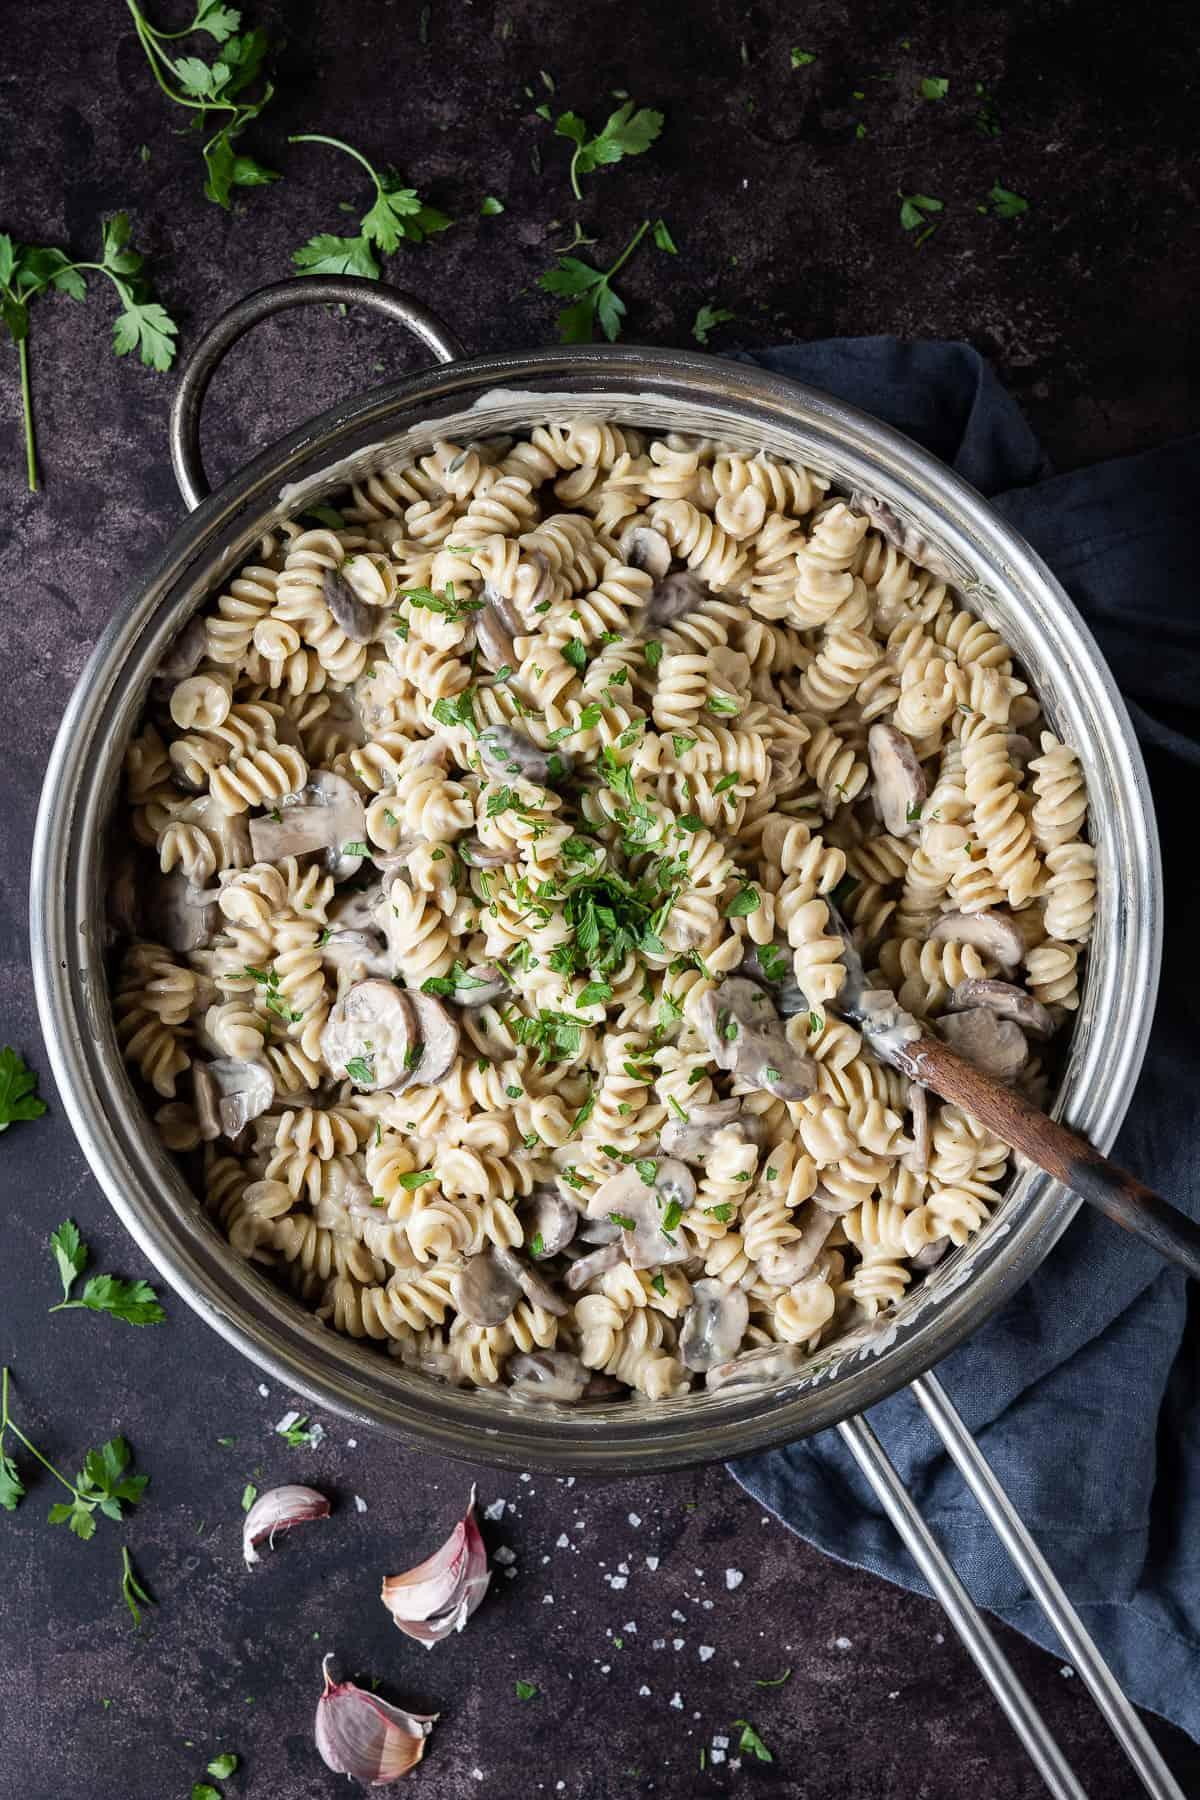 A metal pan of creamy vegan mushroom pasta on a dark surface with fresh parsley and garlic skins.